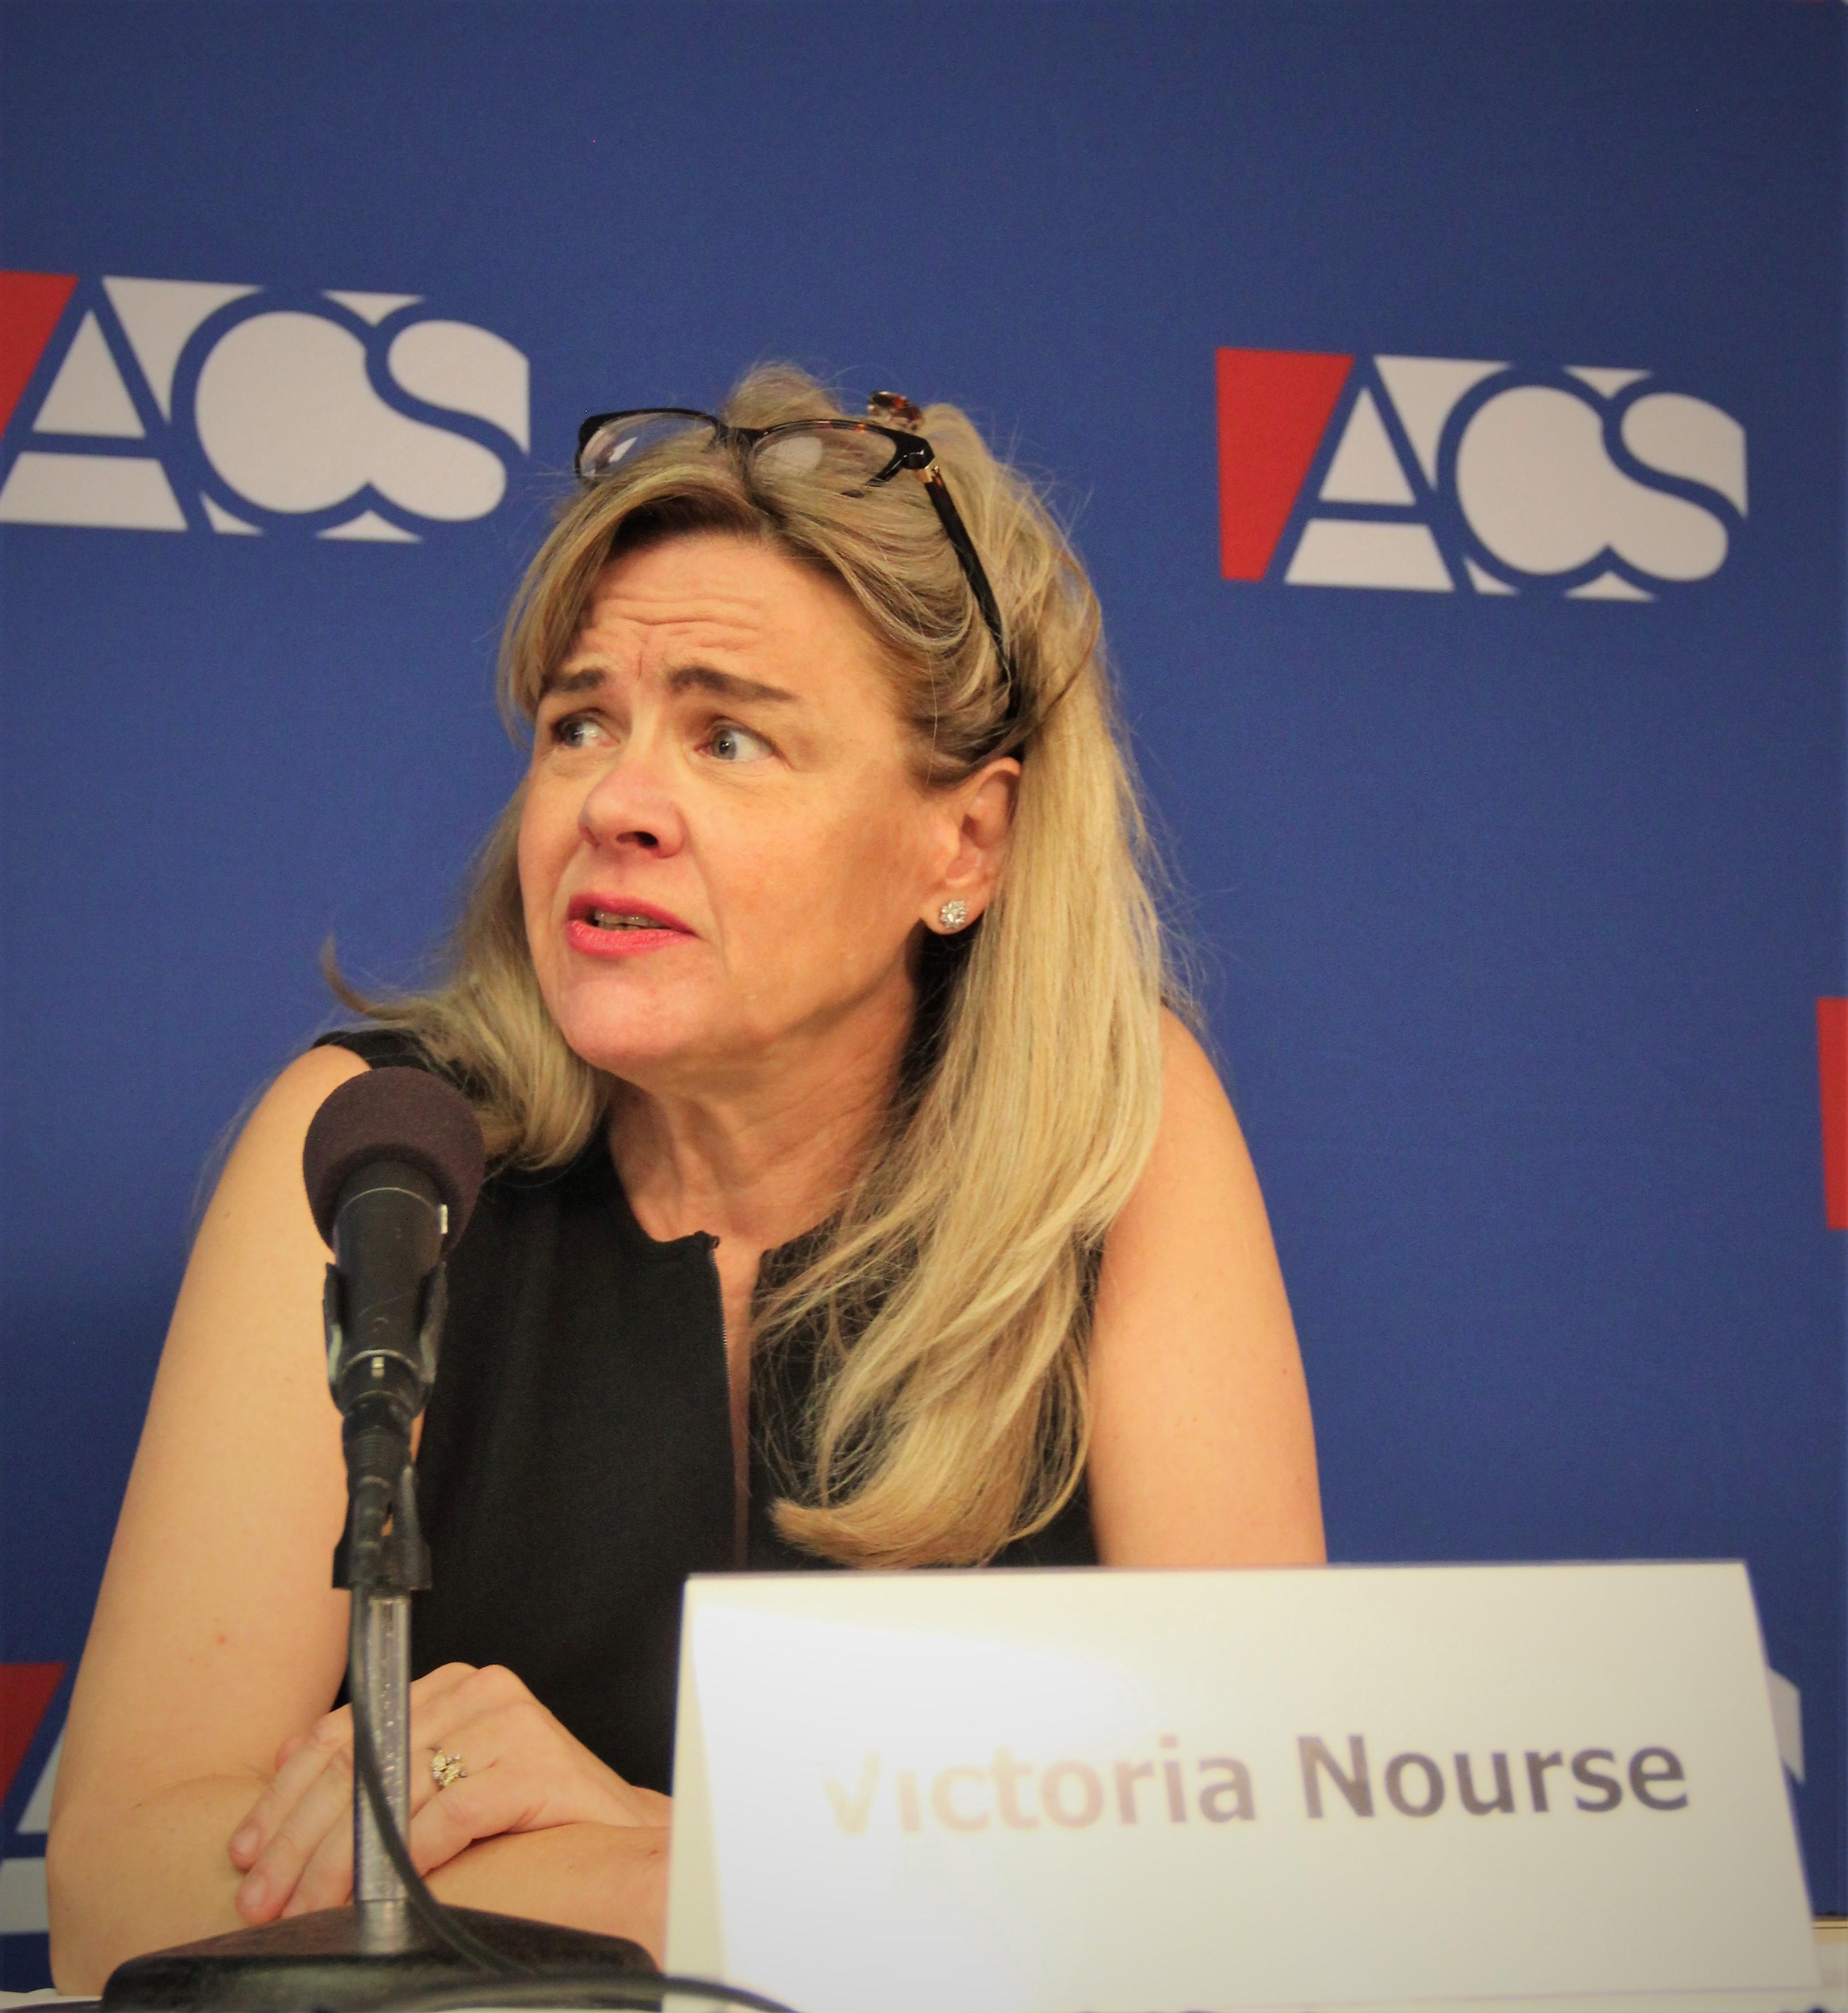 Victoria Nourse